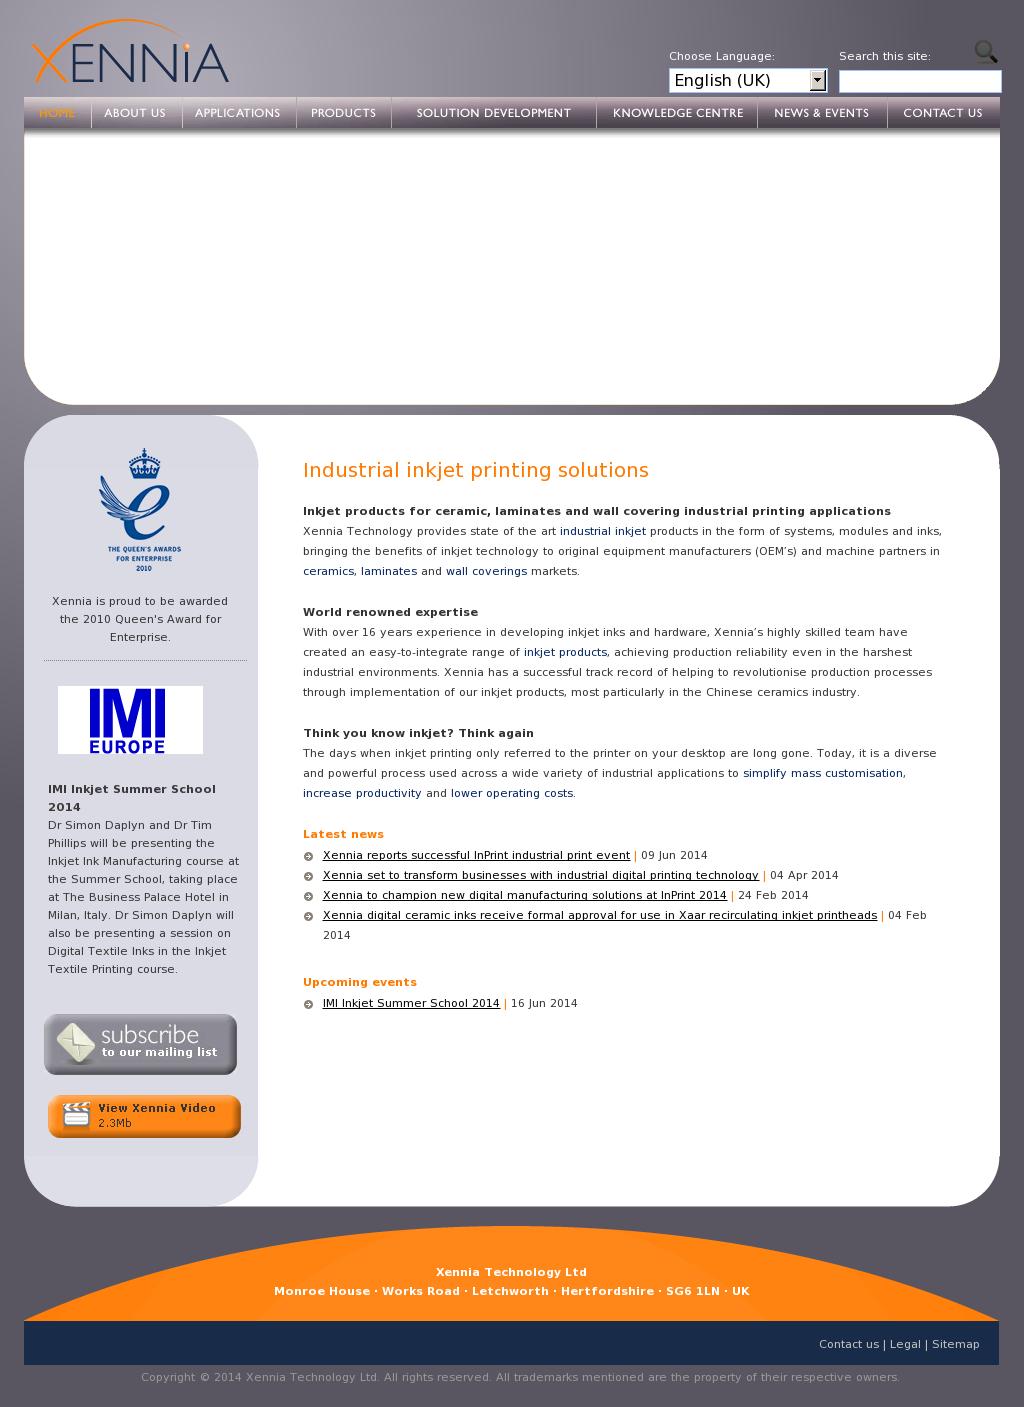 Xennia Competitors, Revenue and Employees - Owler Company